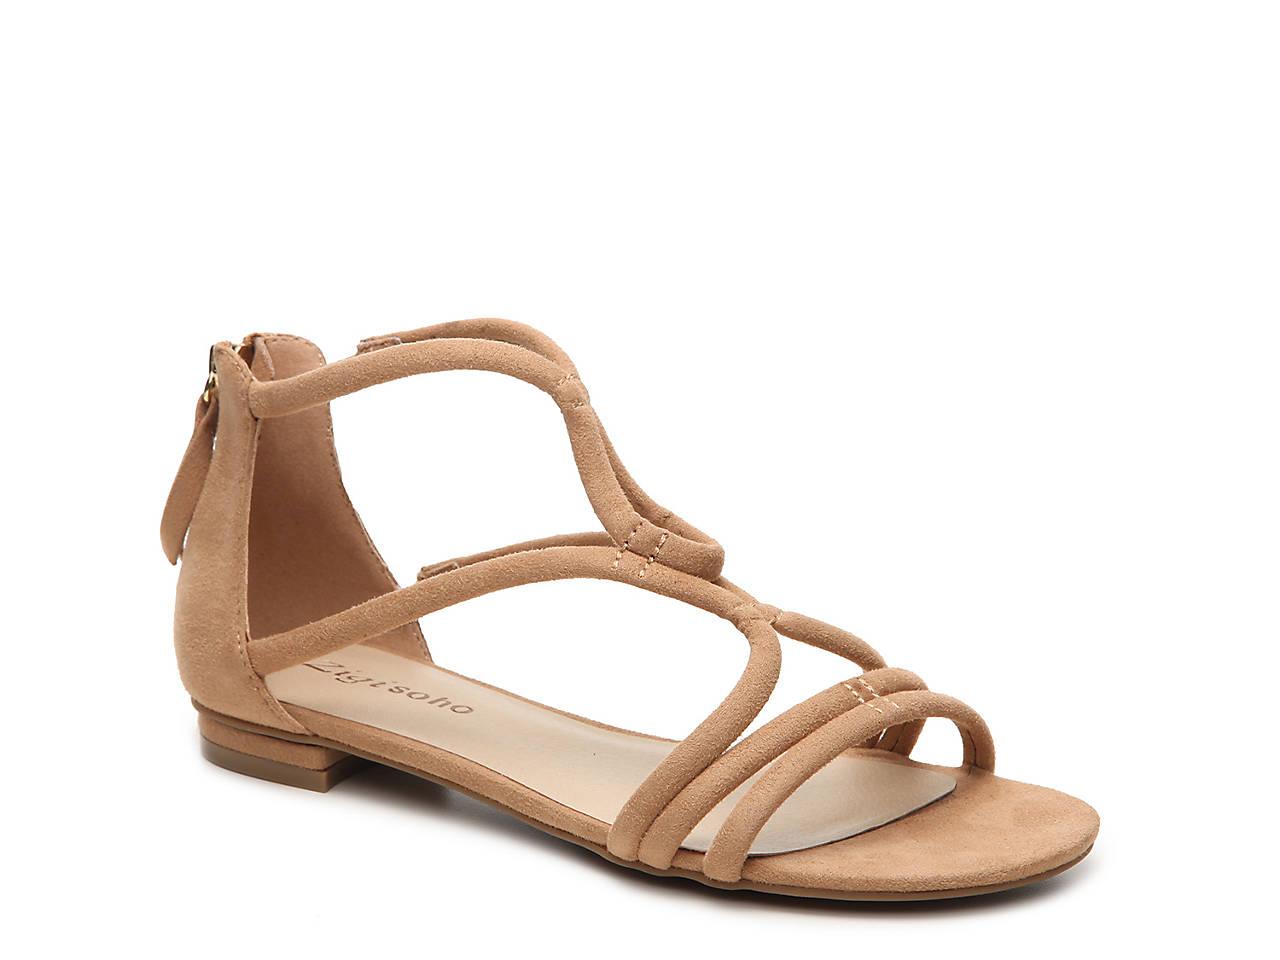 cd56f23bafeb Zigi Soho Pierre Flat Sandal Women s Shoes